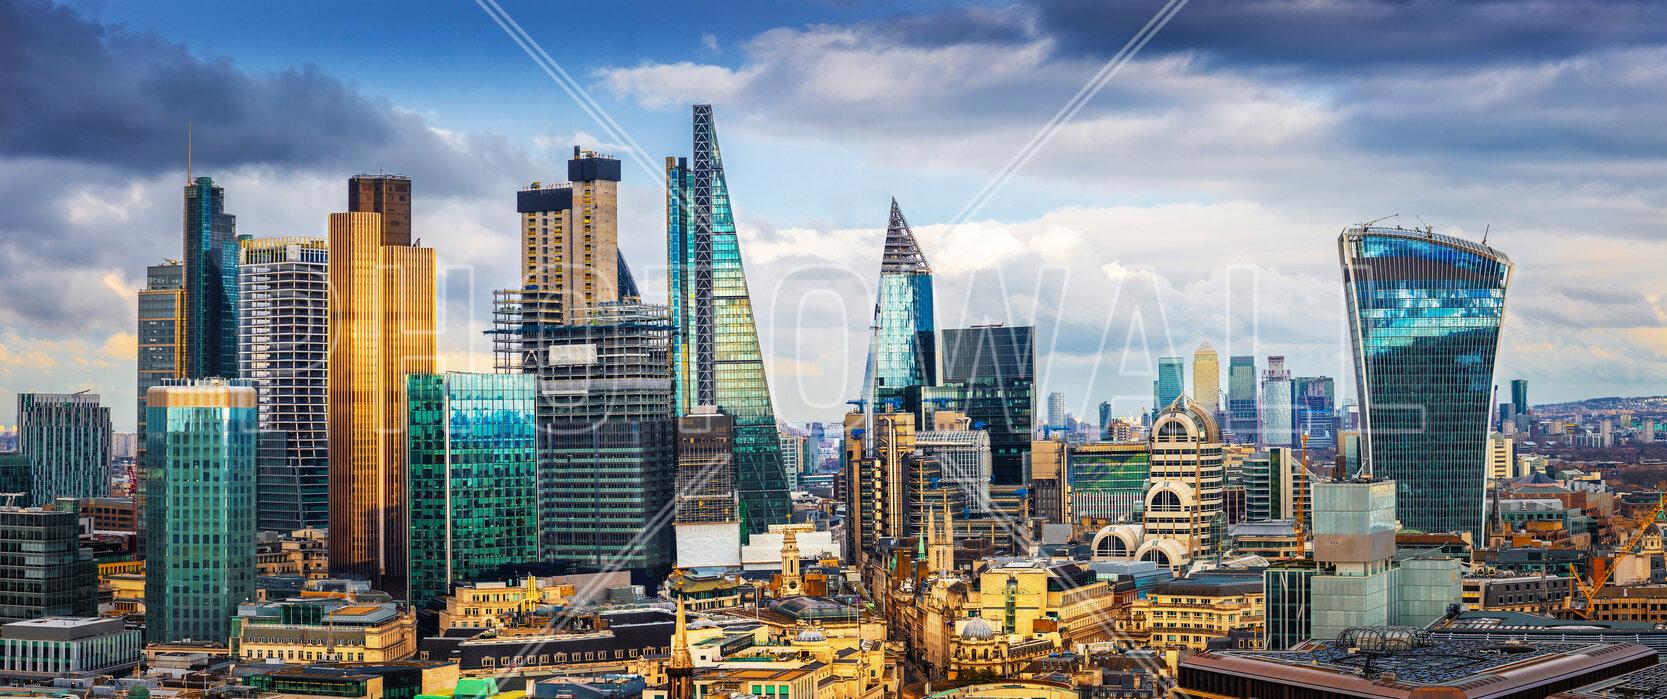 London Skyline Evocative Poster Photowall